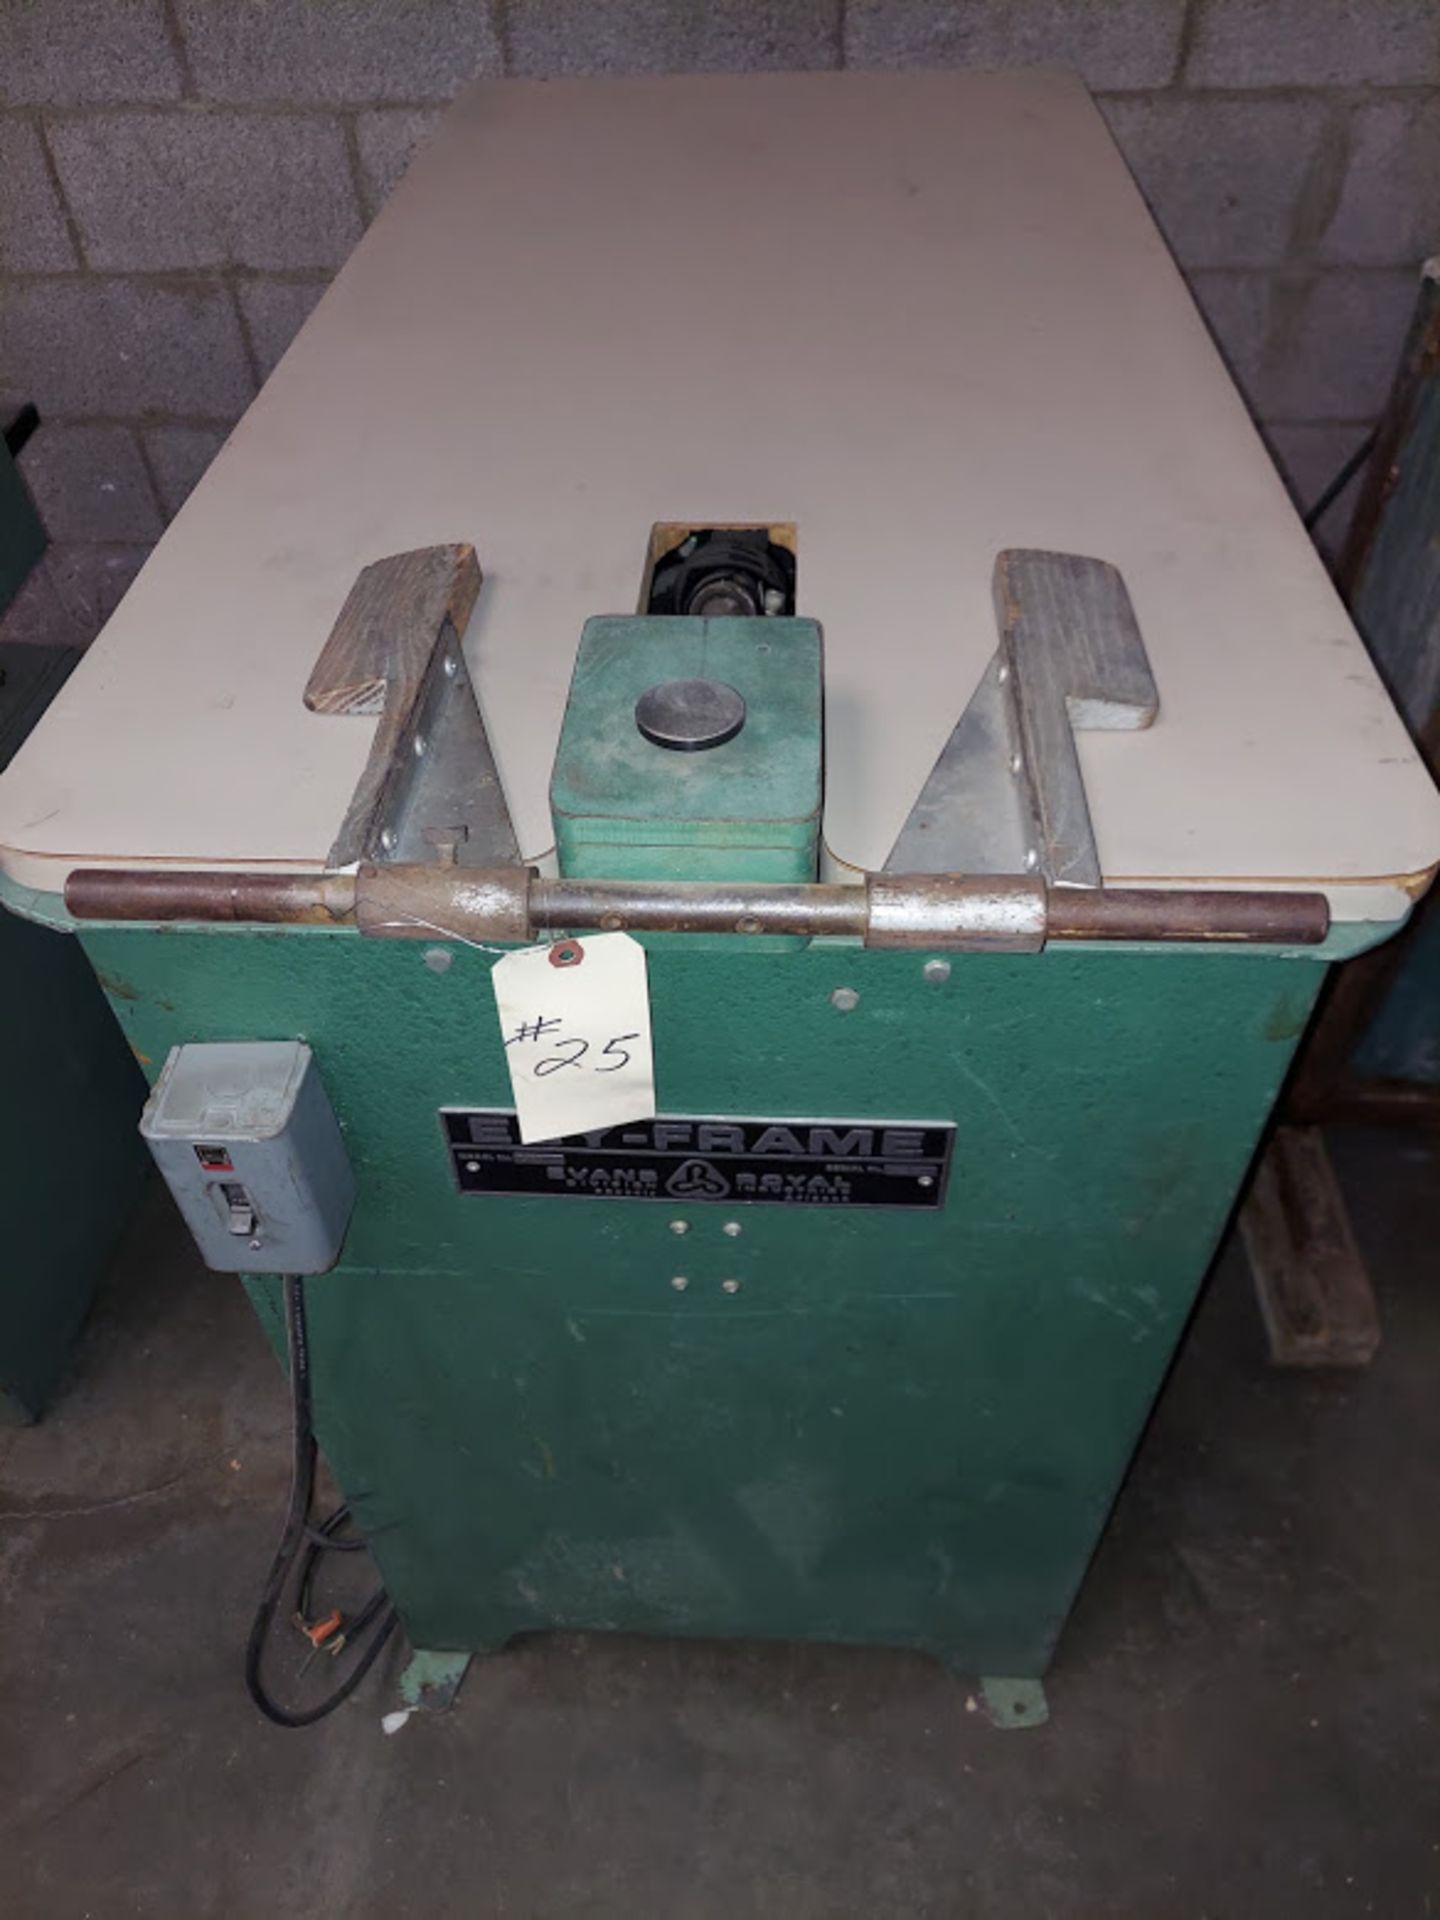 Evans & Royal Pocket Boring Machine, Model # 600, Dayton 115 Volts 1 Phase Motor